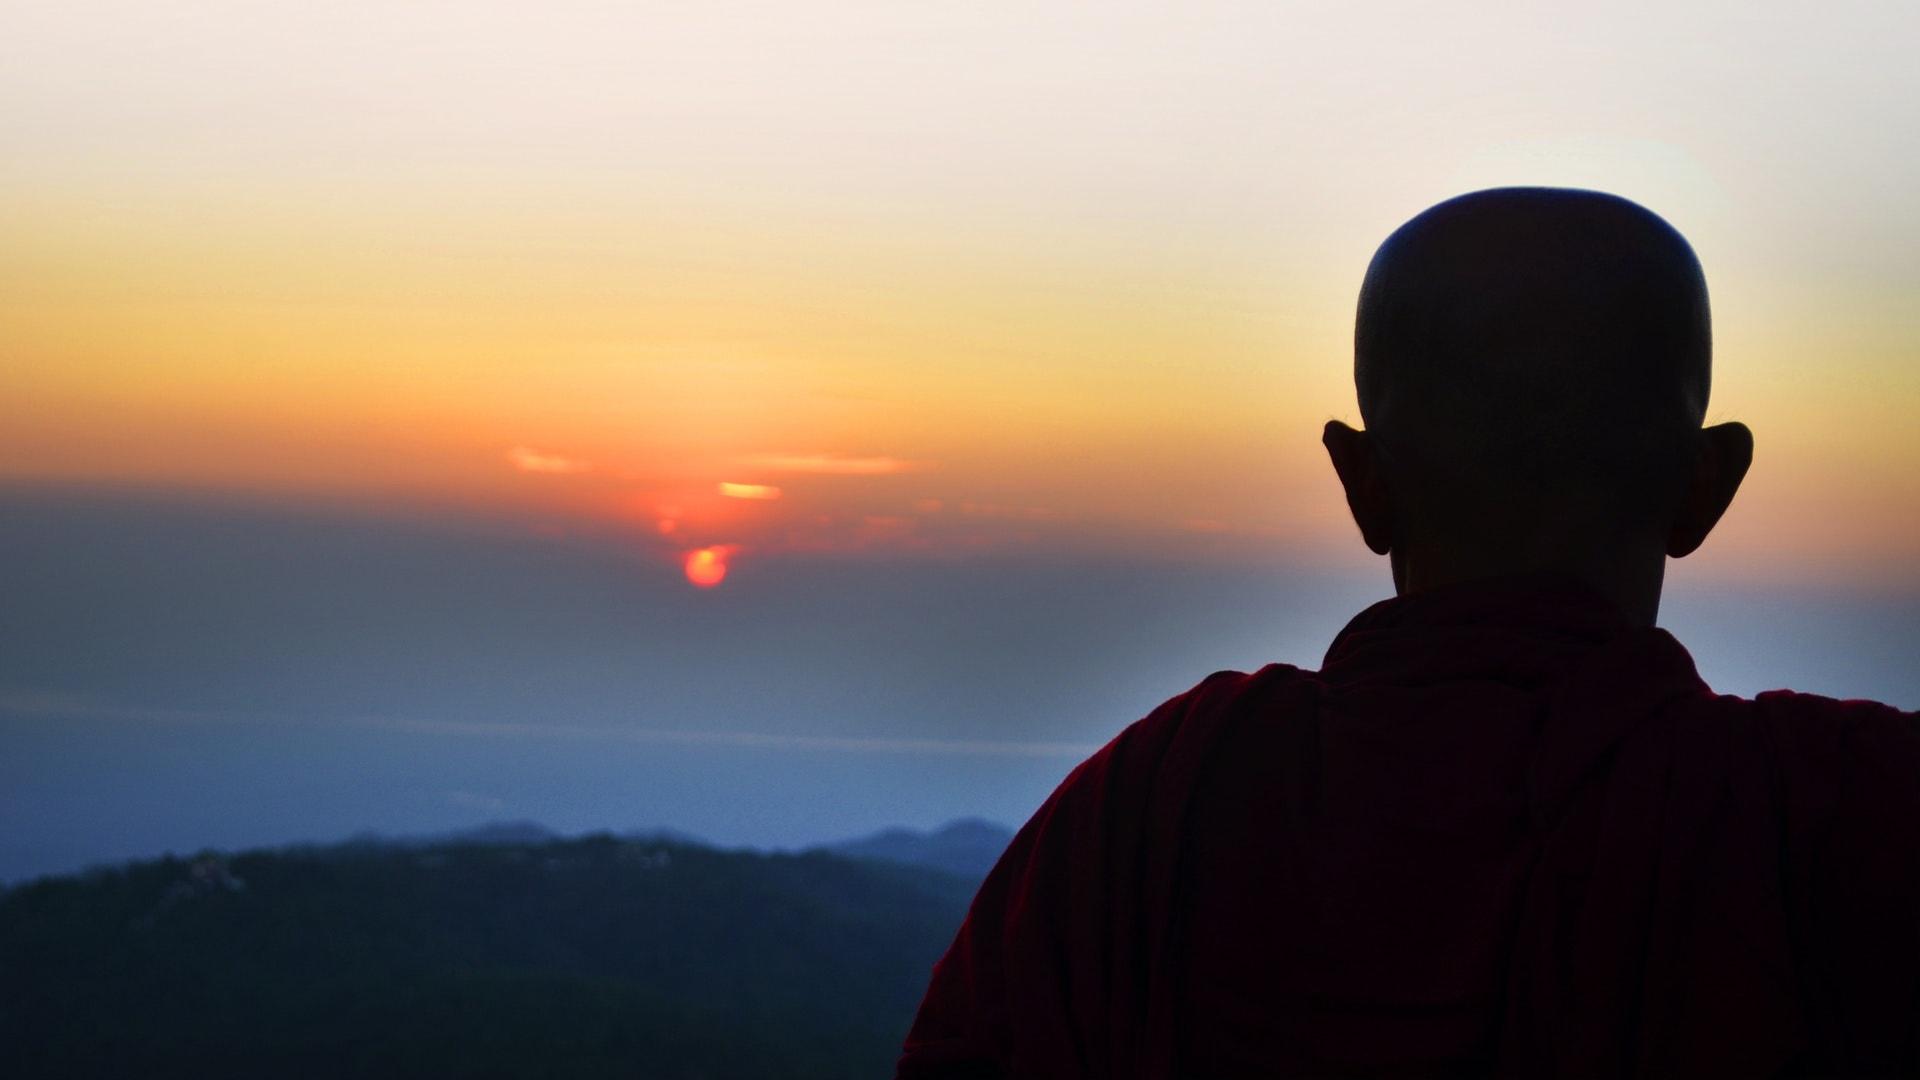 Yoga101 What Is Bhakti Yoga And Why Should You Do It Everyday Yogi360 Prlog